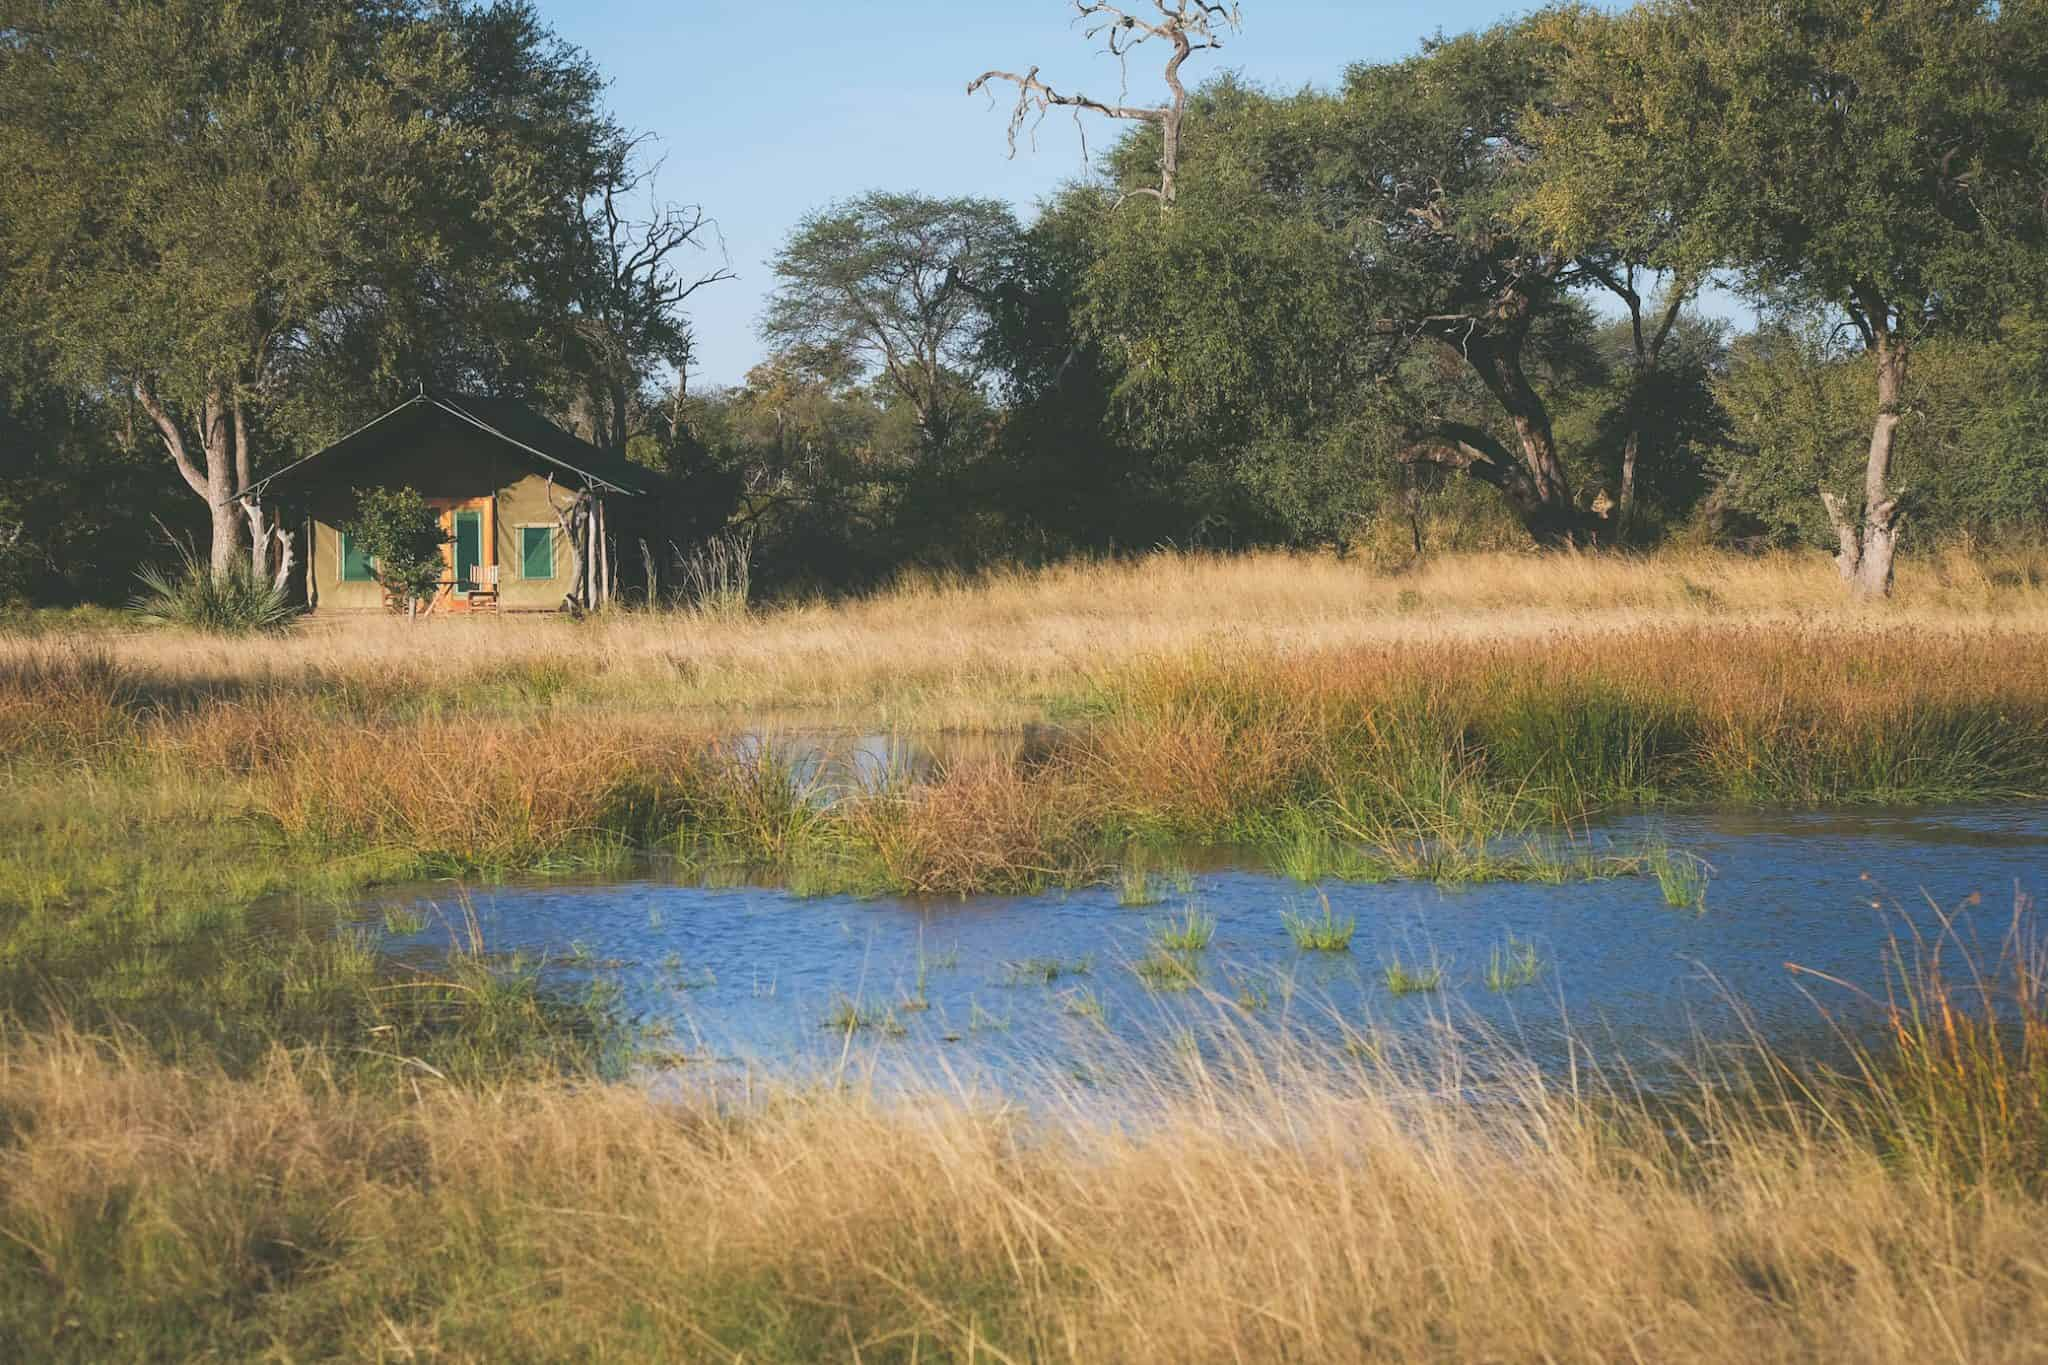 Imvelo Safari Lodges